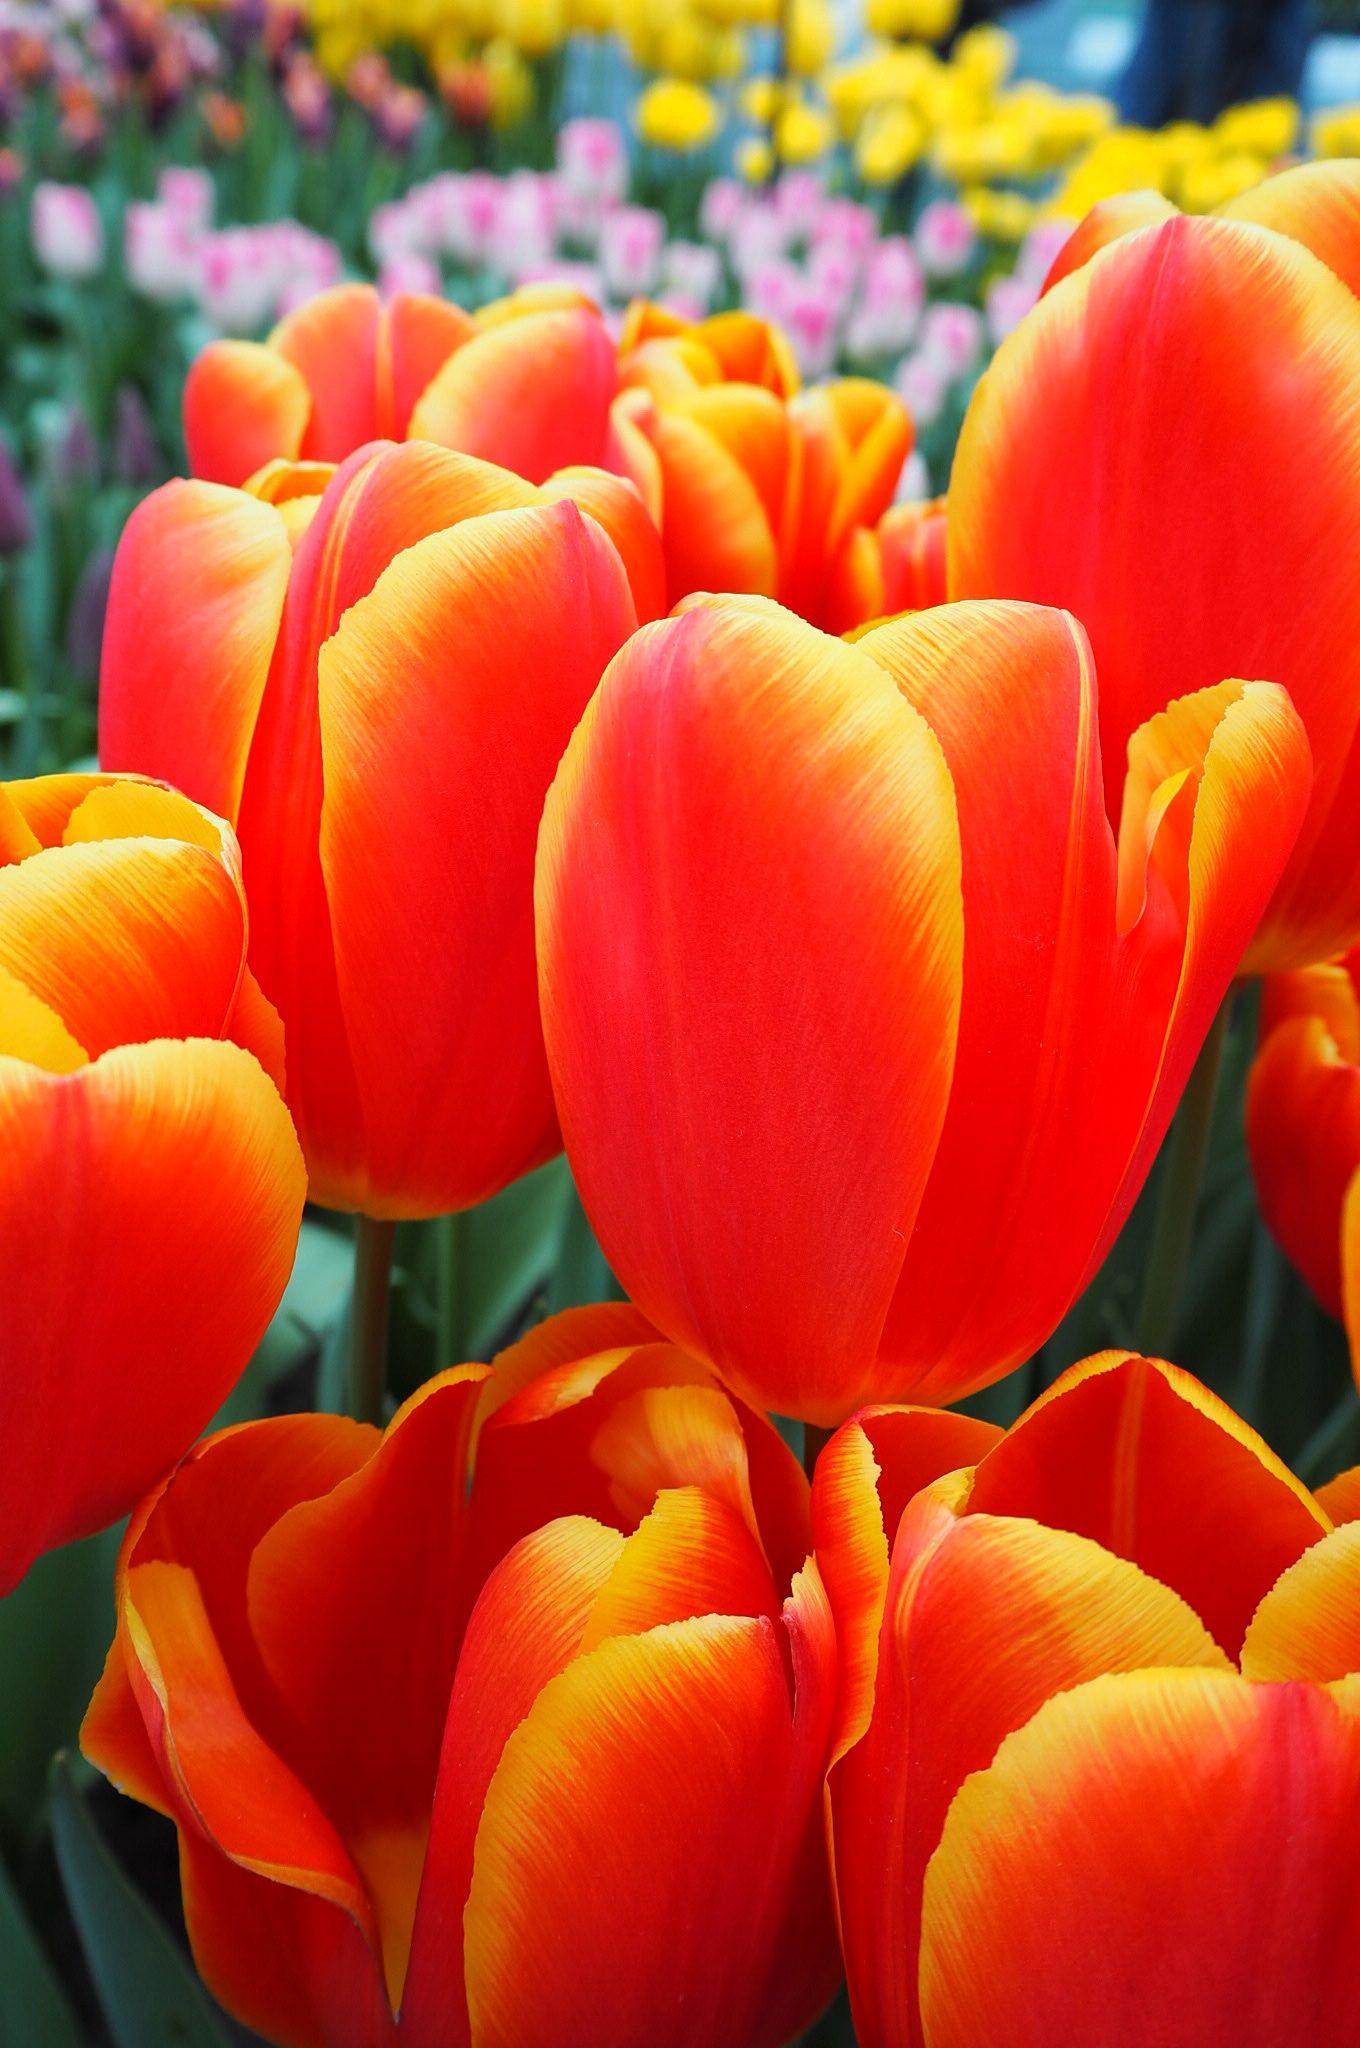 Netherlands Tulip Tours - Best time to Visit Keukenhof Tulip Gardens in Holland